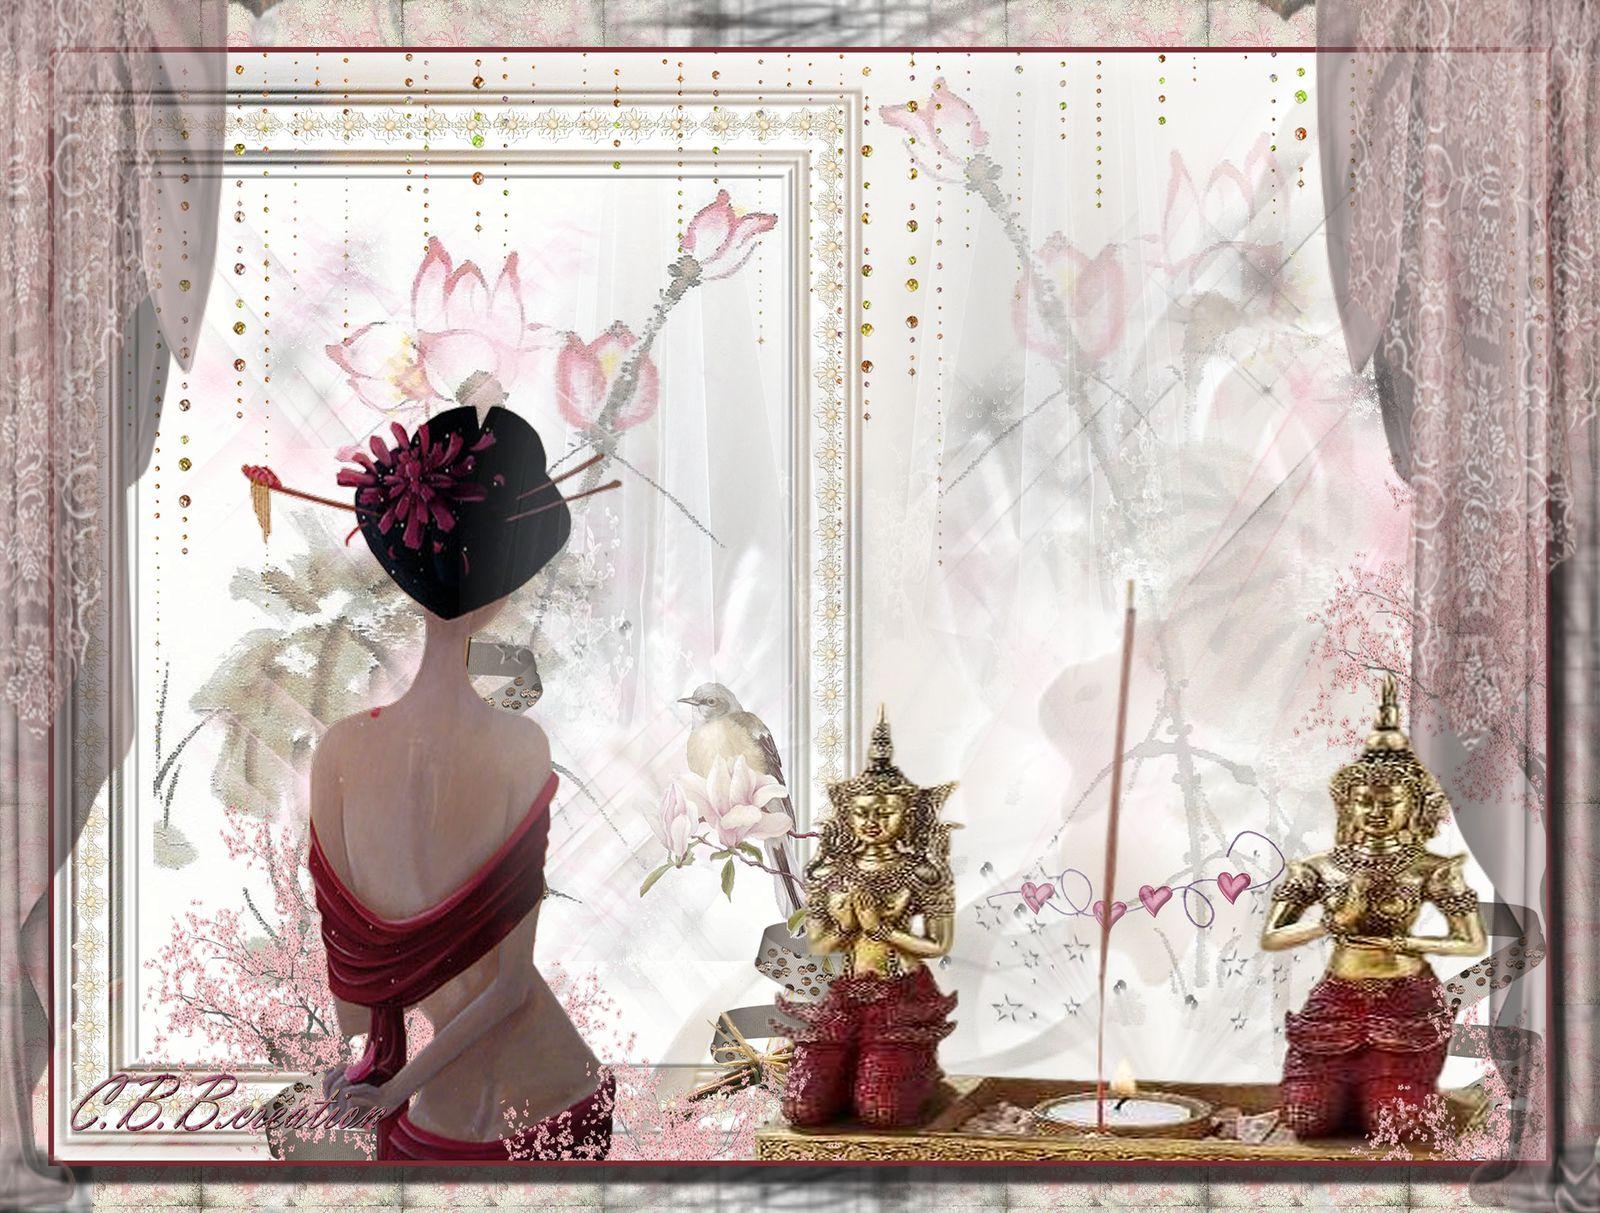 http://idata.over-blog.com/3/91/86/55/ORIENTALE/243-D.jpg